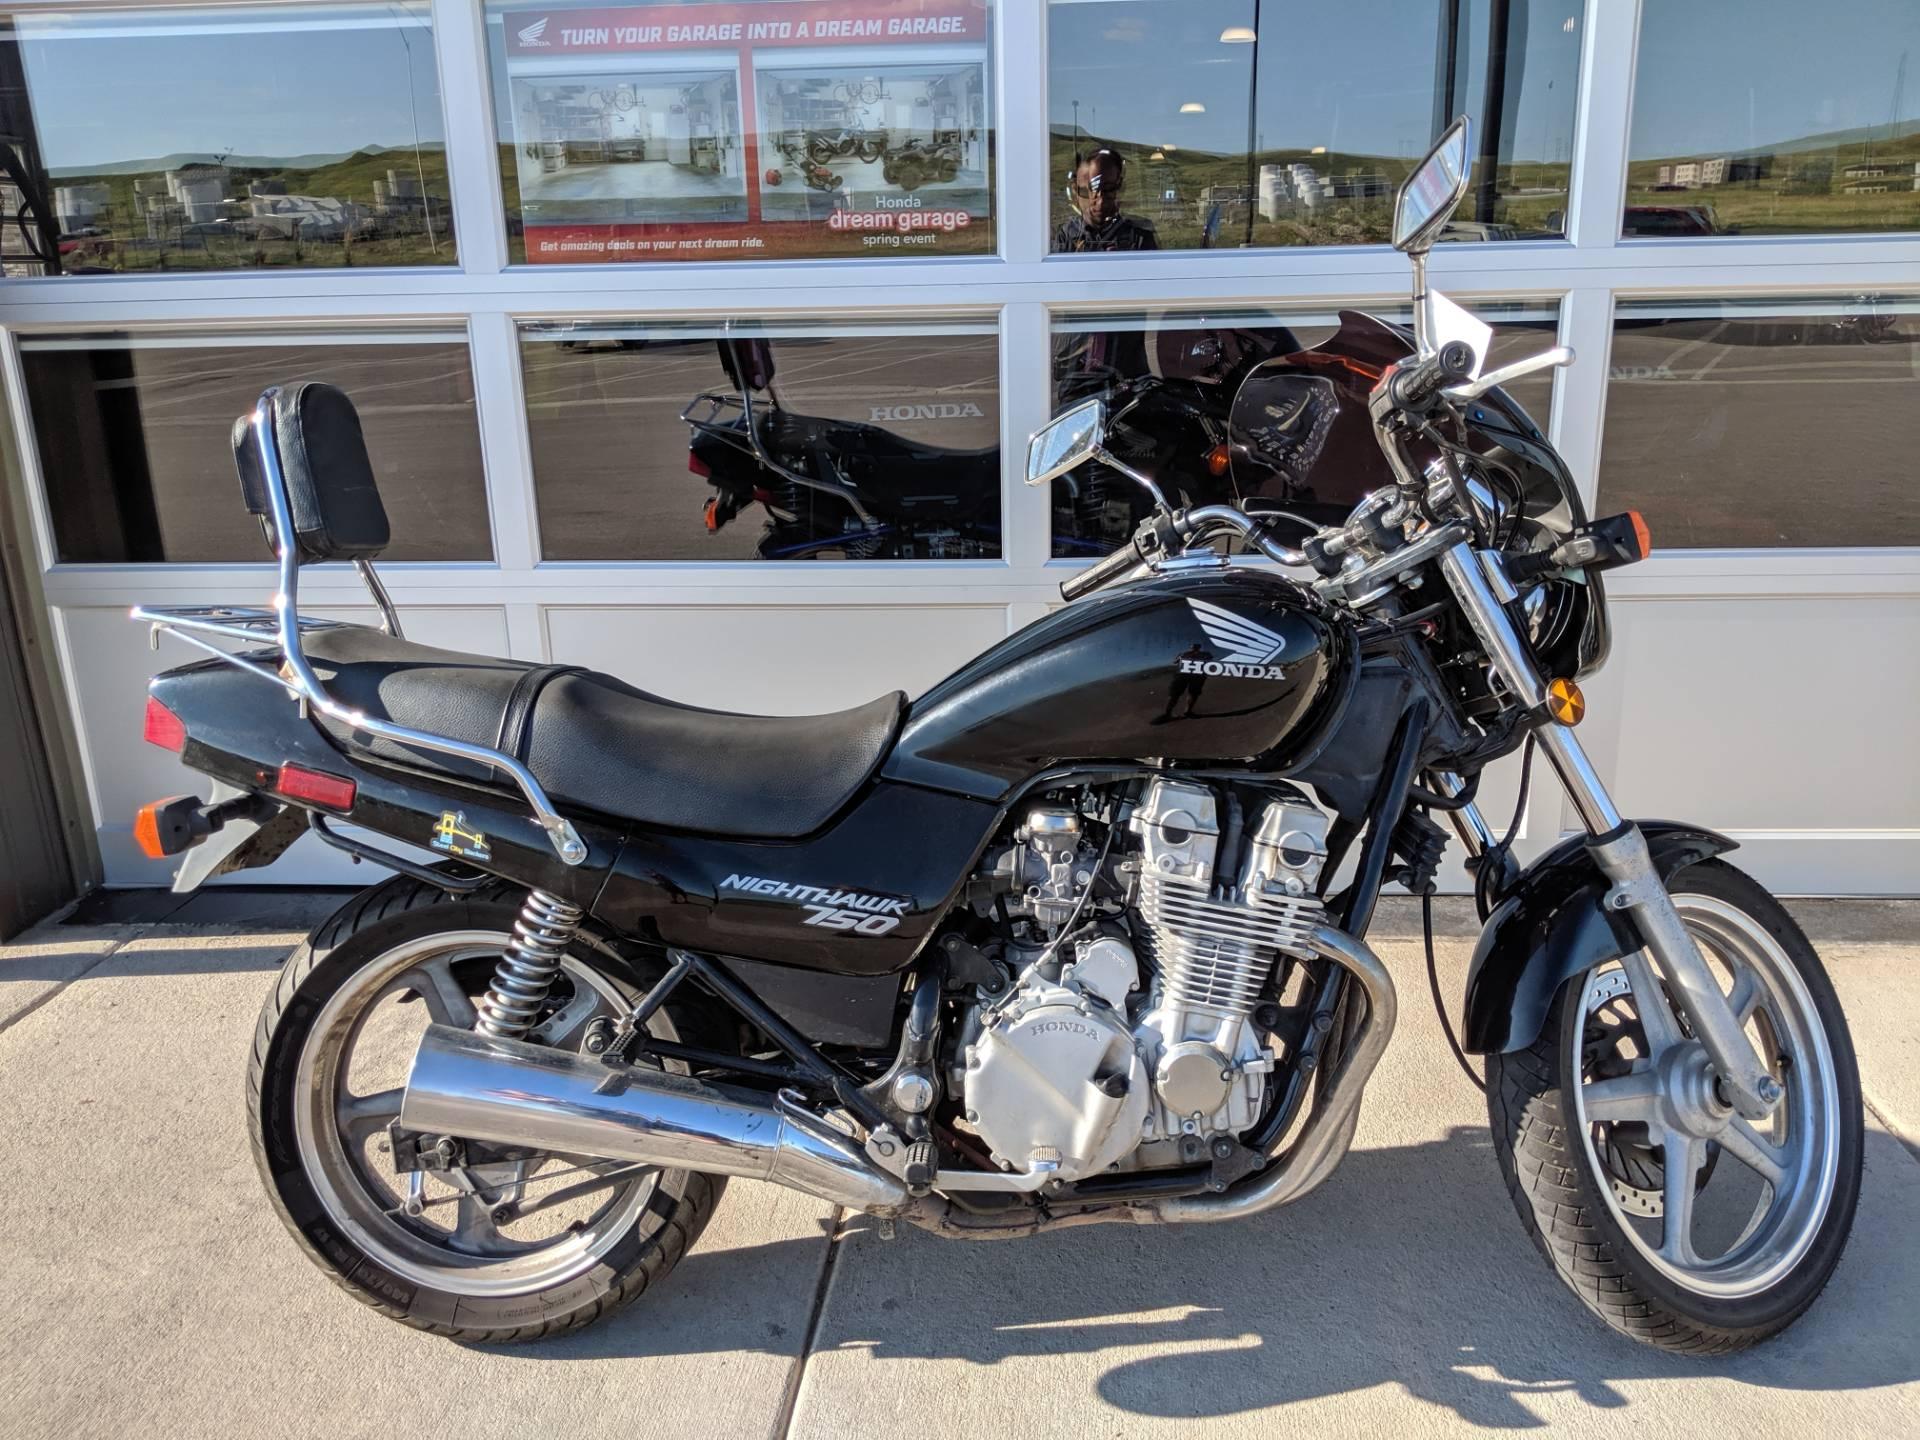 Used 1995 Honda VF750C Motorcycles in Rapid City, SD